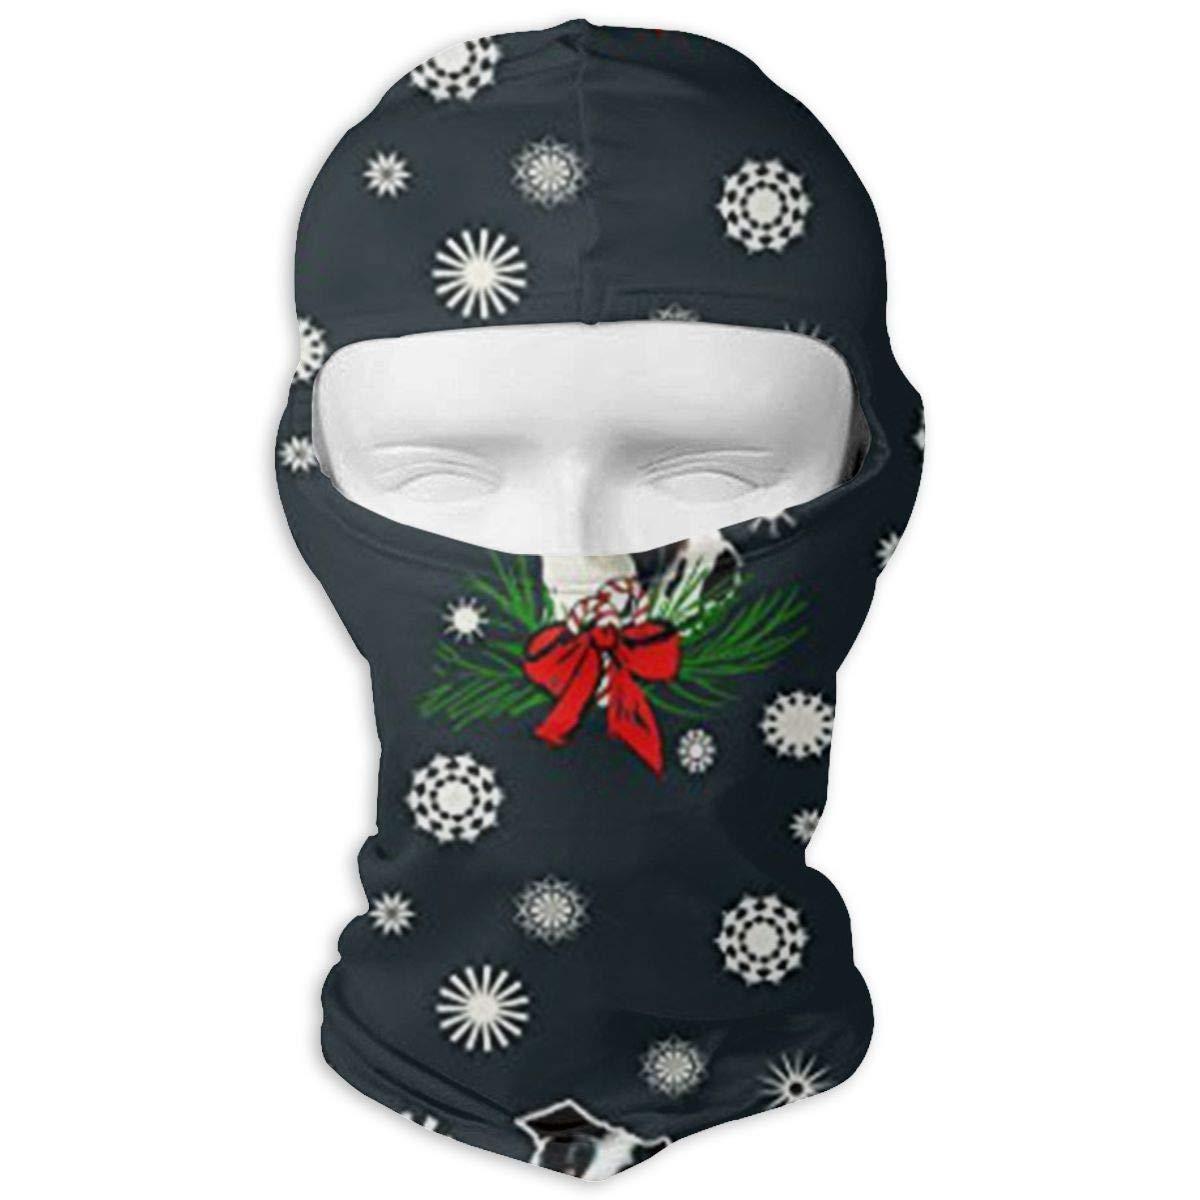 LaoJi Border Collie Christmas Winter Ski Mask Balaclava Hood Wind-Resistant Face Mask